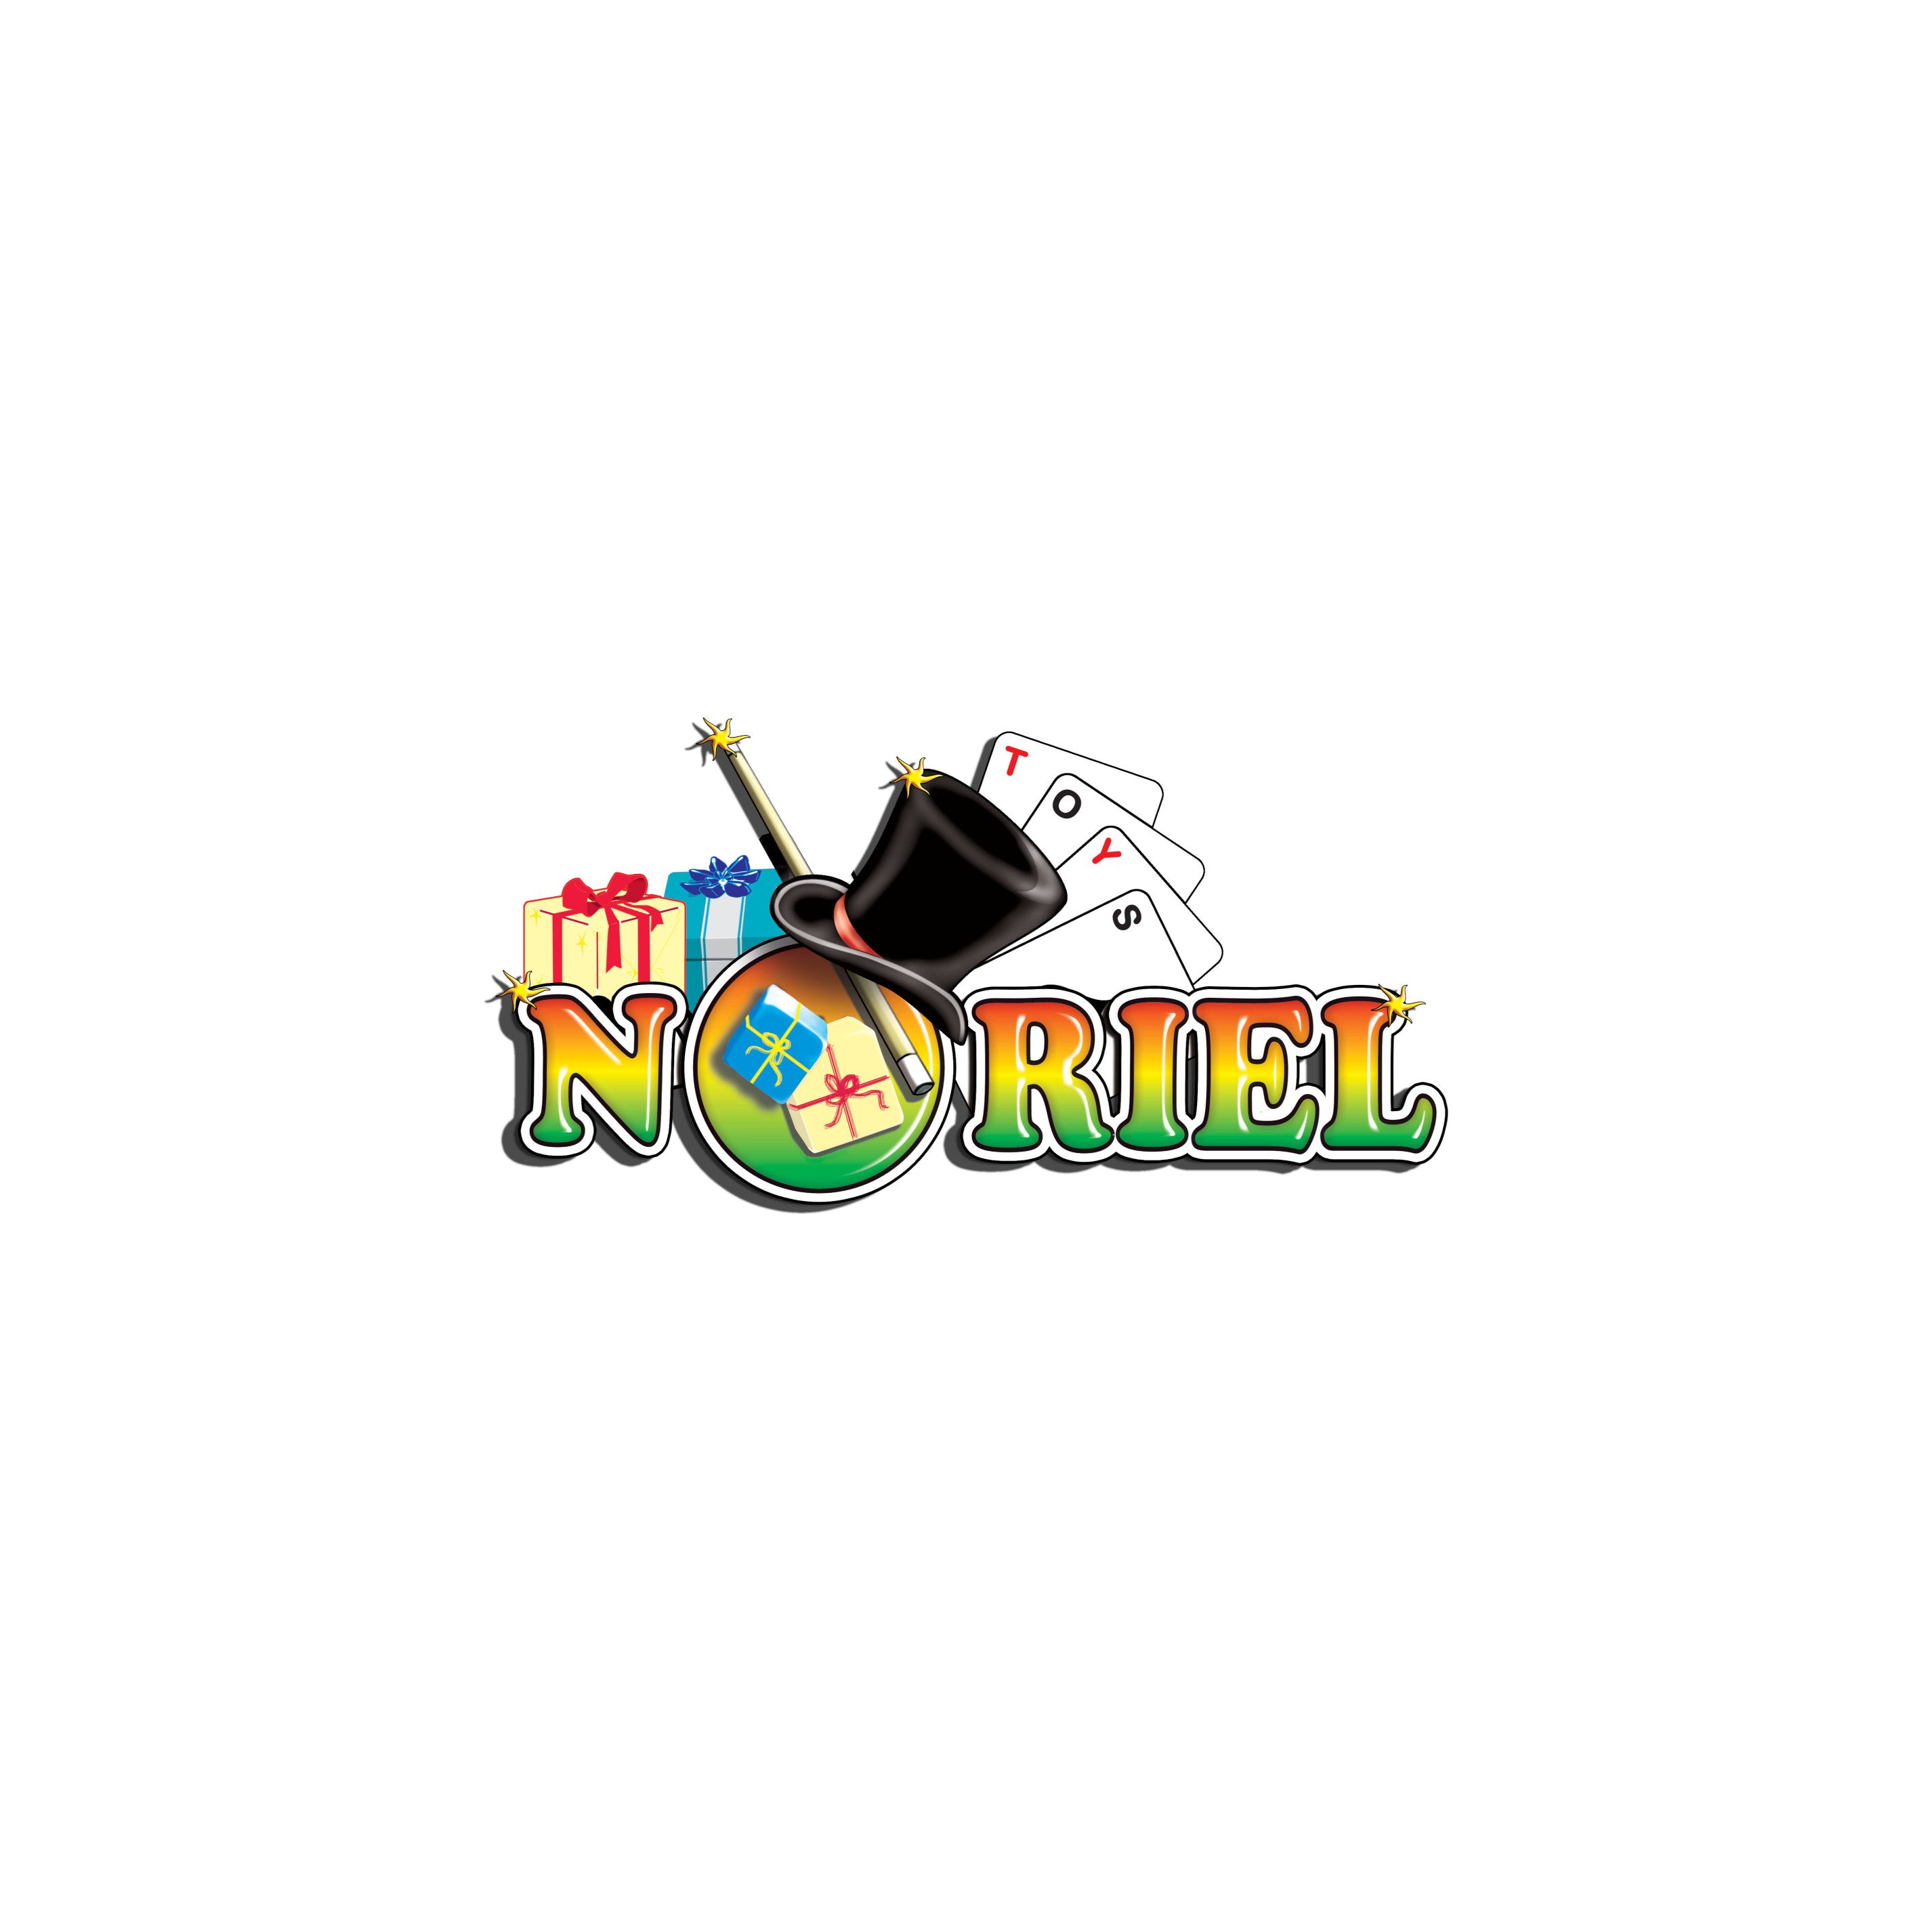 Figurina Incredibles 2 - Frozone, 10 cm 1